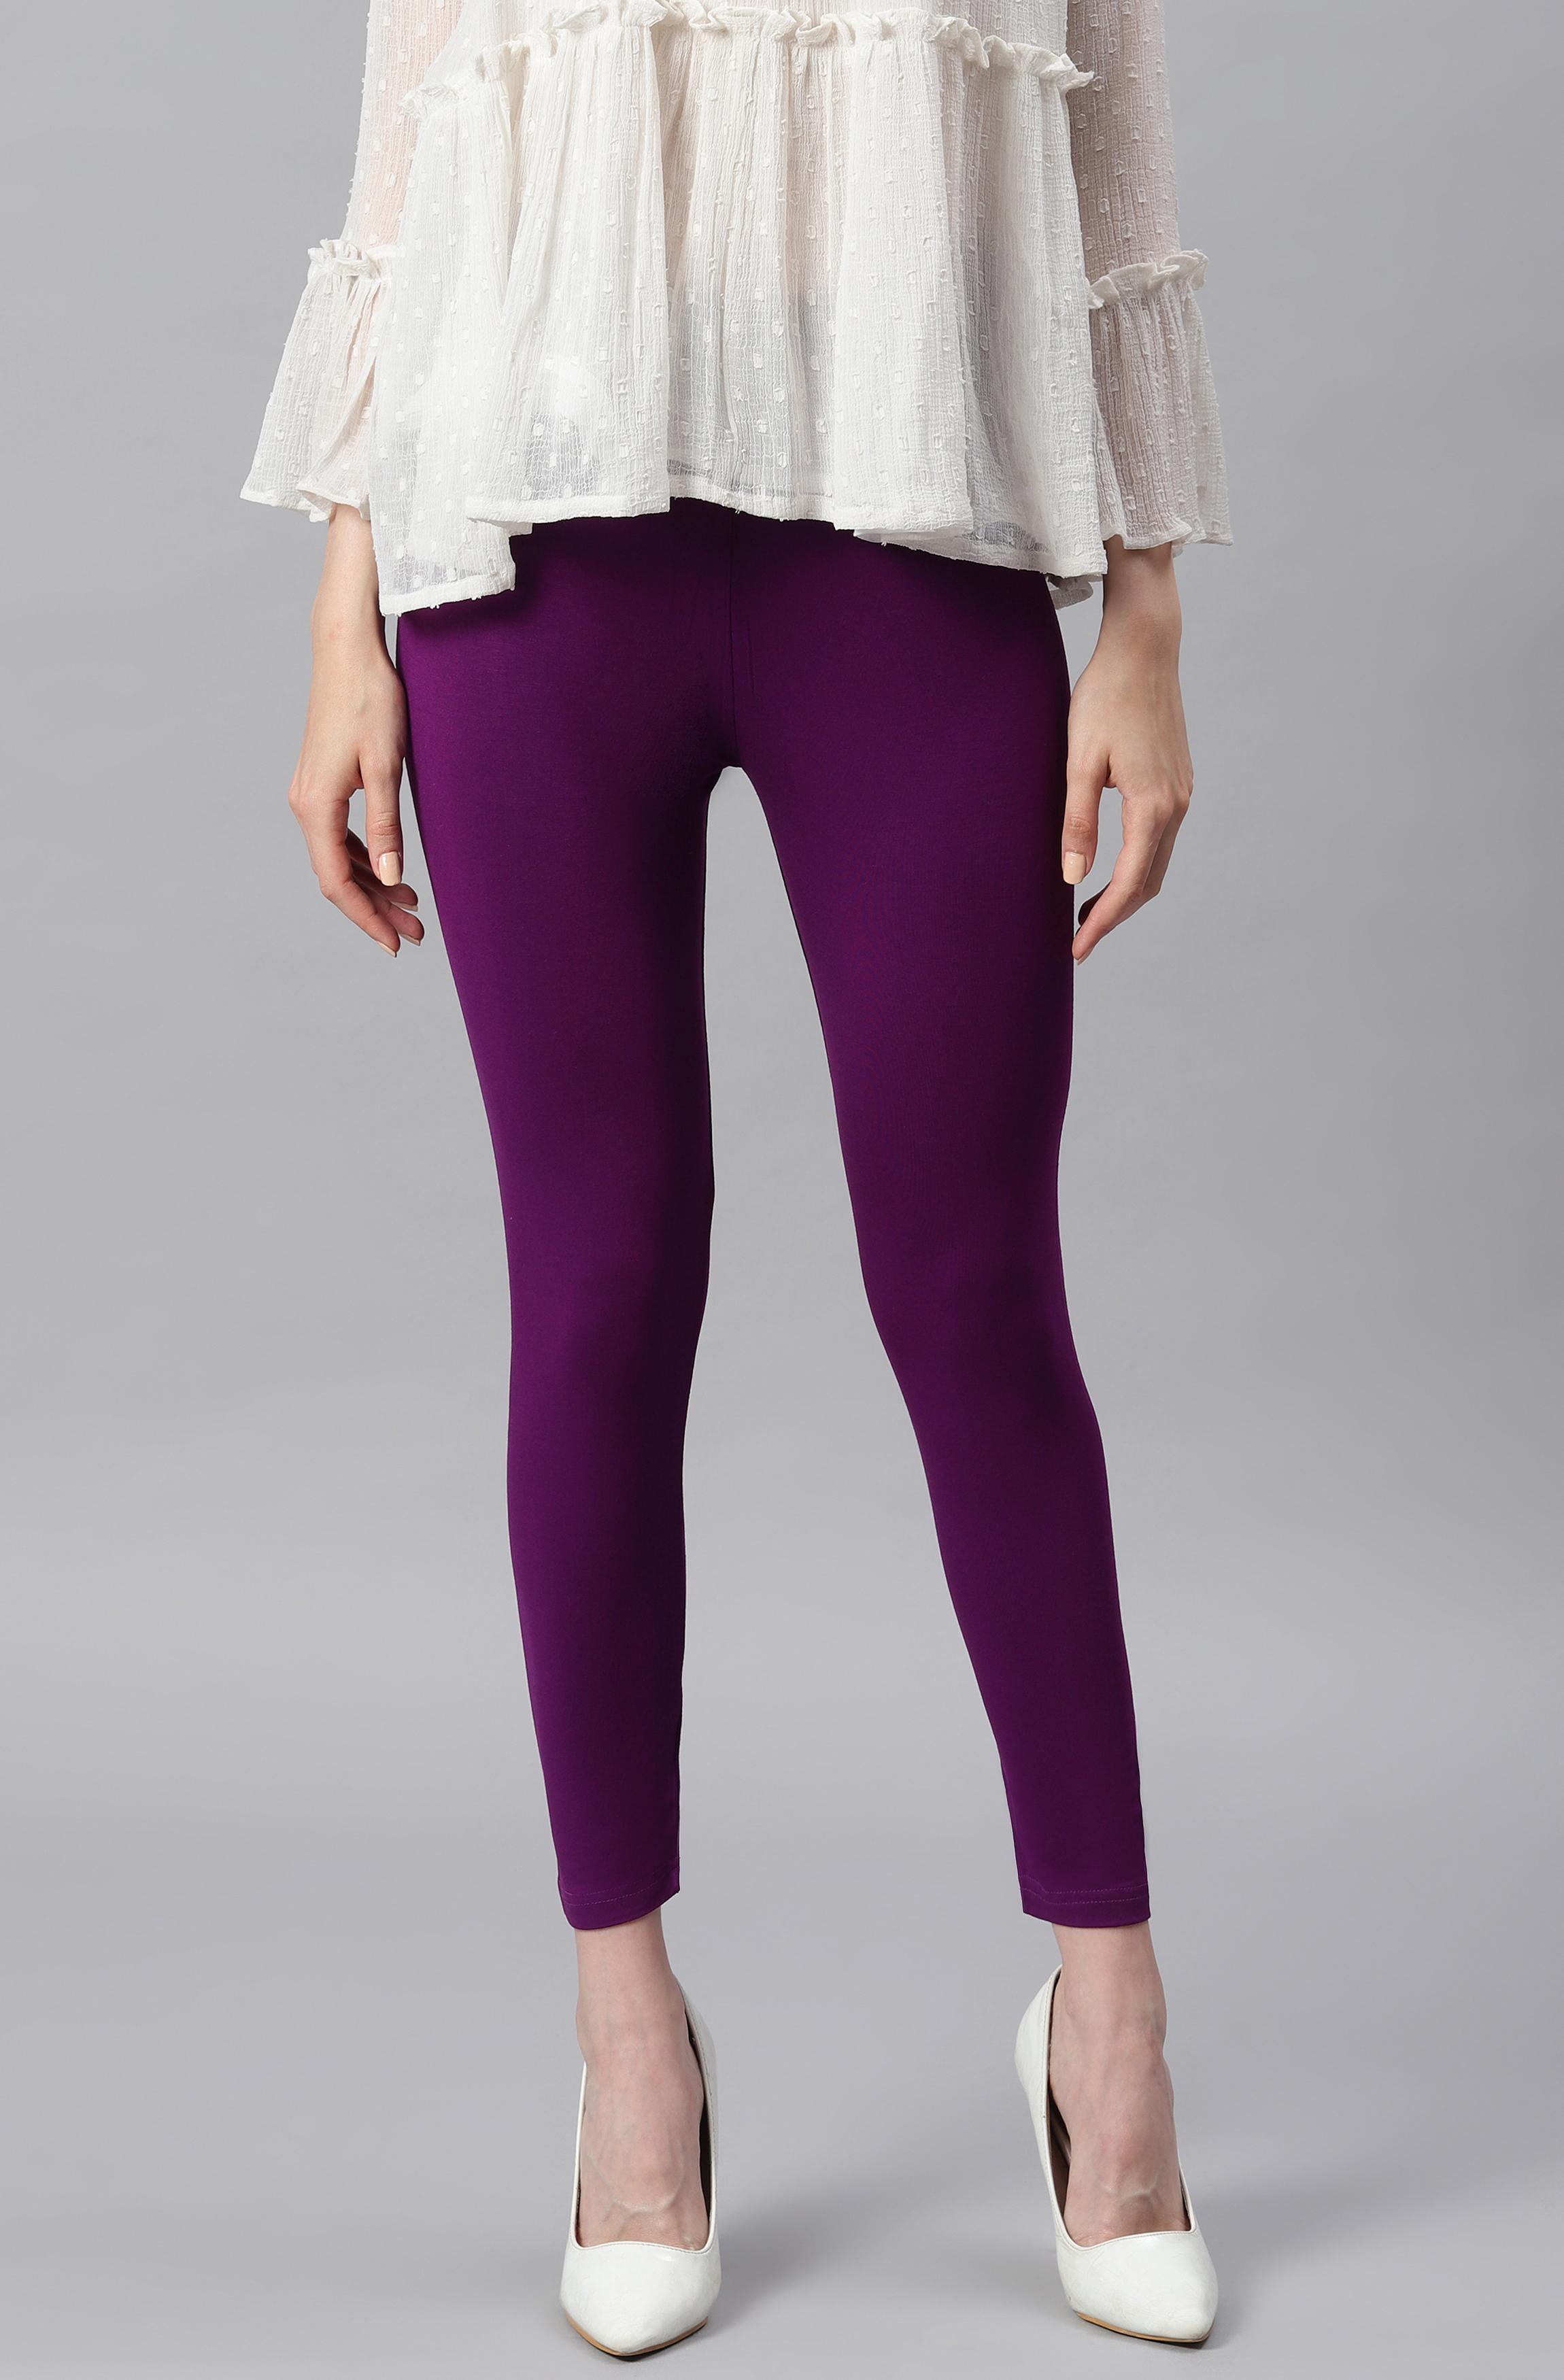 Janasya | Janasya Women's Purple Viscose Lycra Leggings